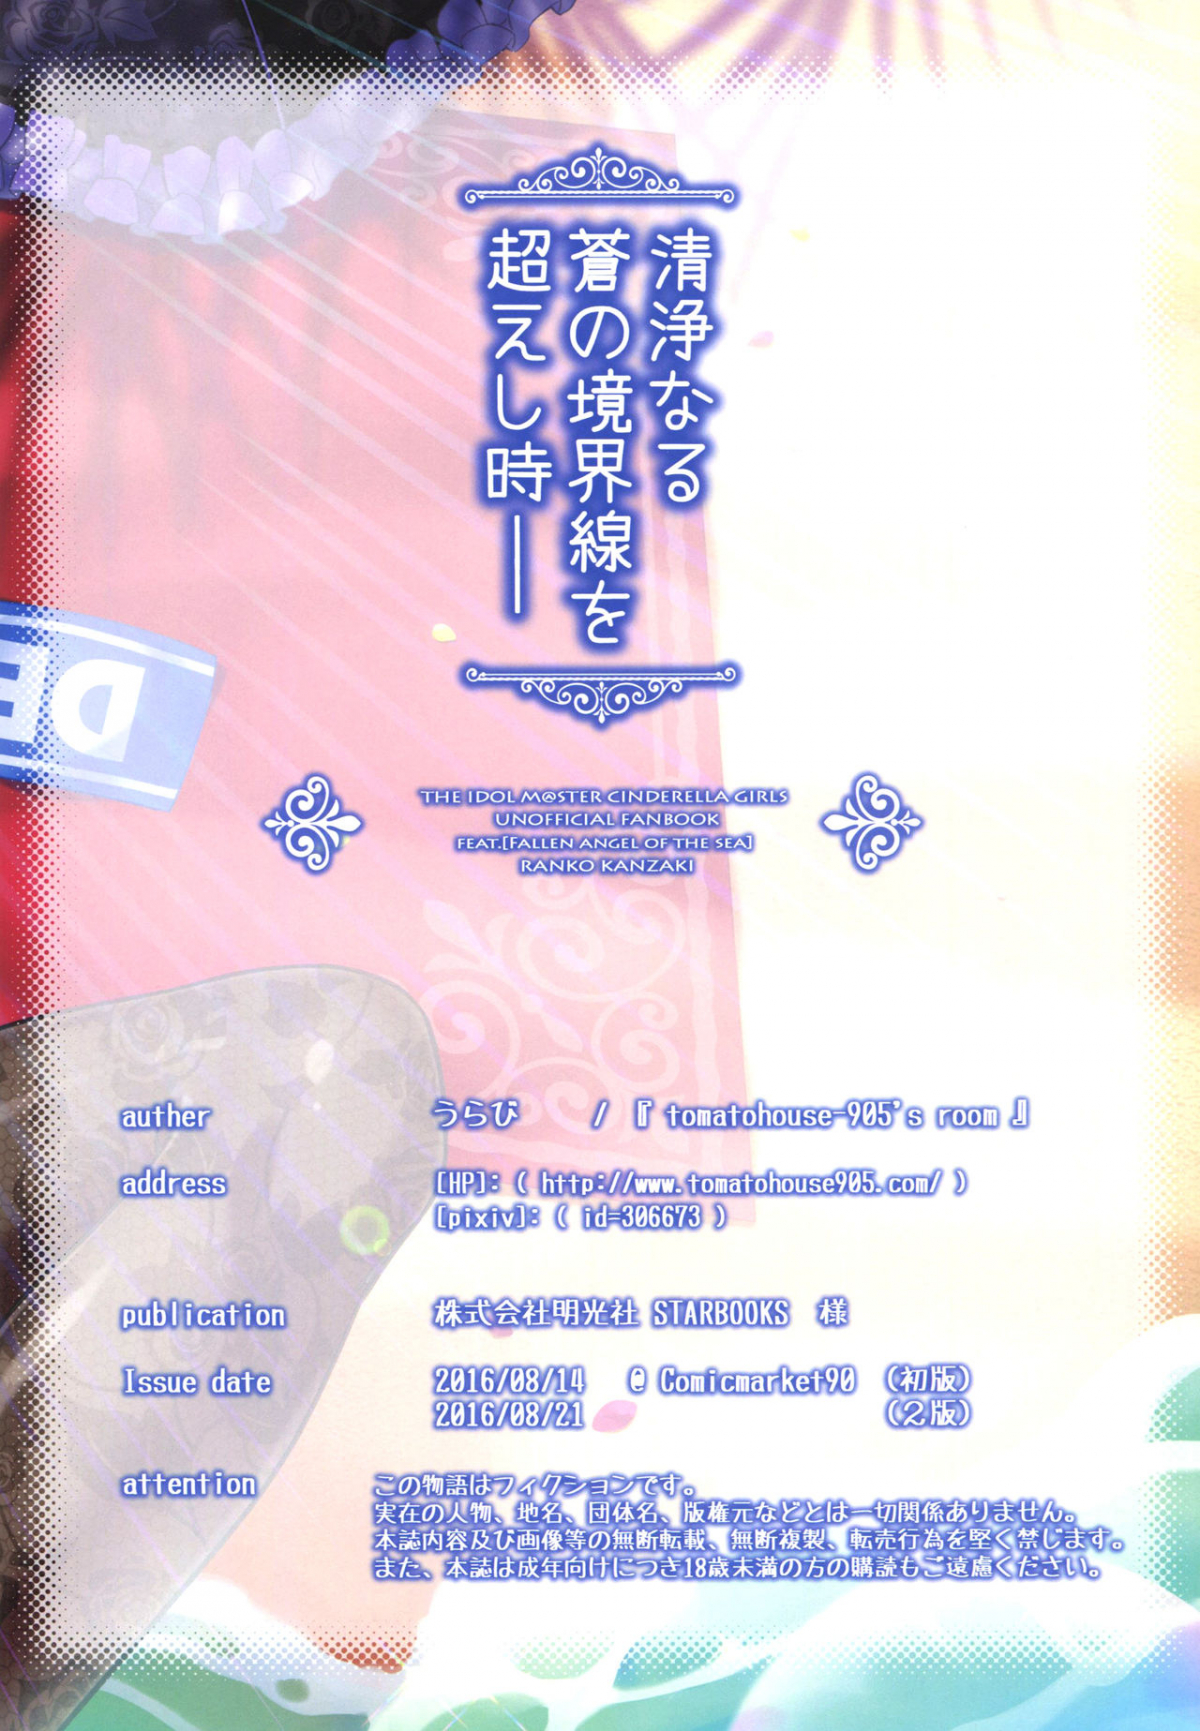 Hình ảnh  trong bài viết Truyện hentai Seijou naru Ao no Kyoukaisen o Koeshi Toki